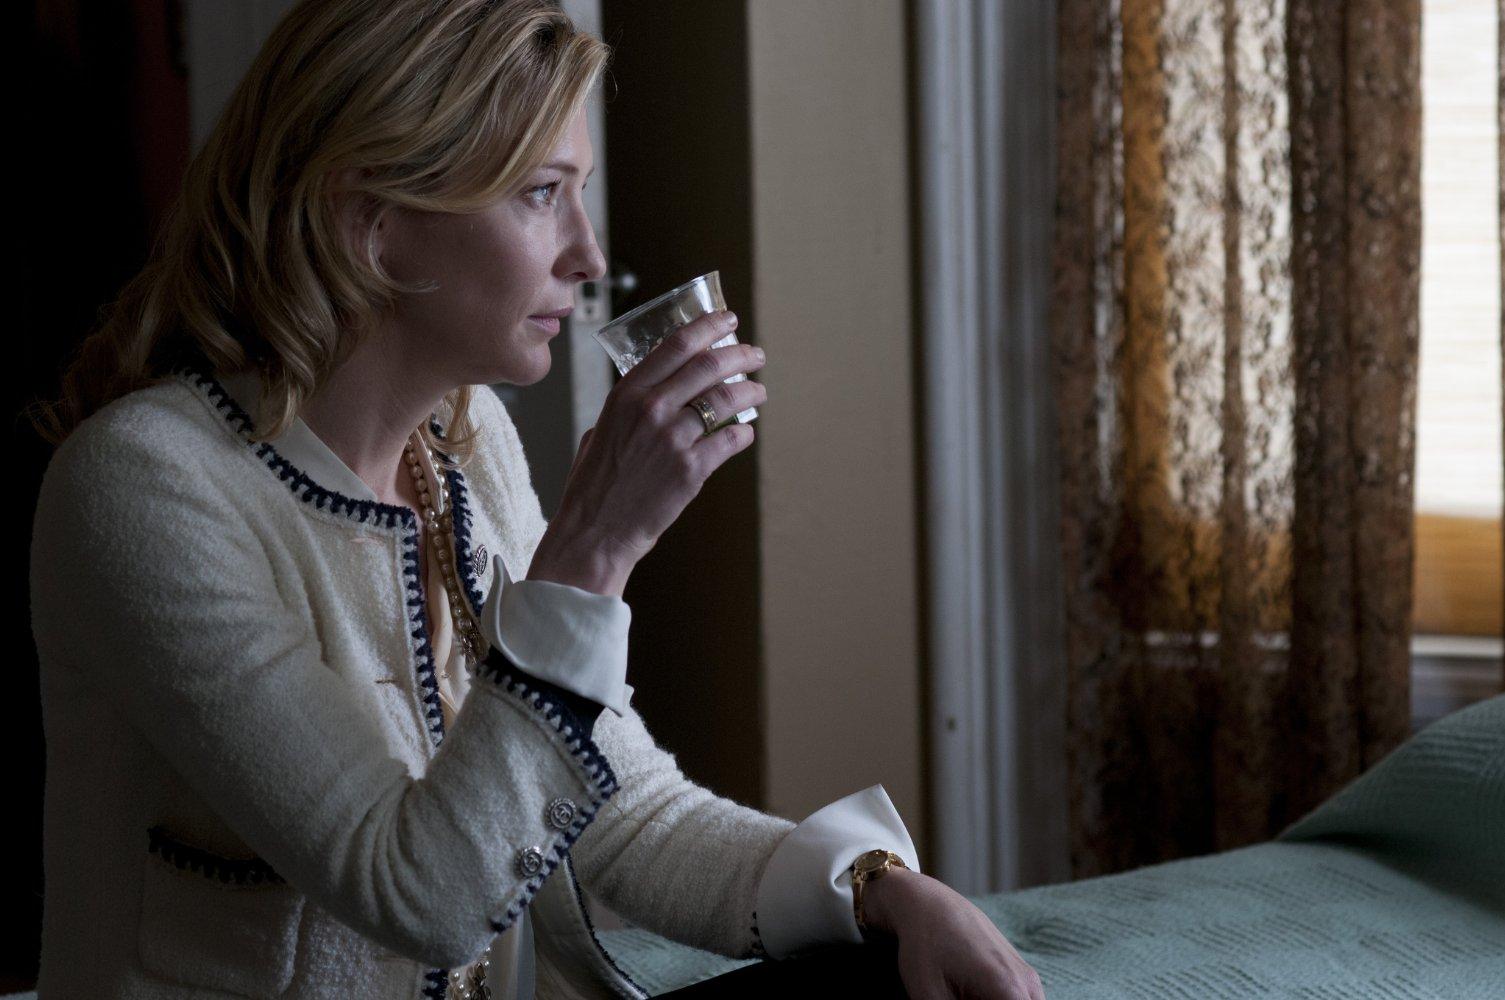 Лучшая женская роль Оскар 25 лет Кейт Бланшетт Жасмин 2013